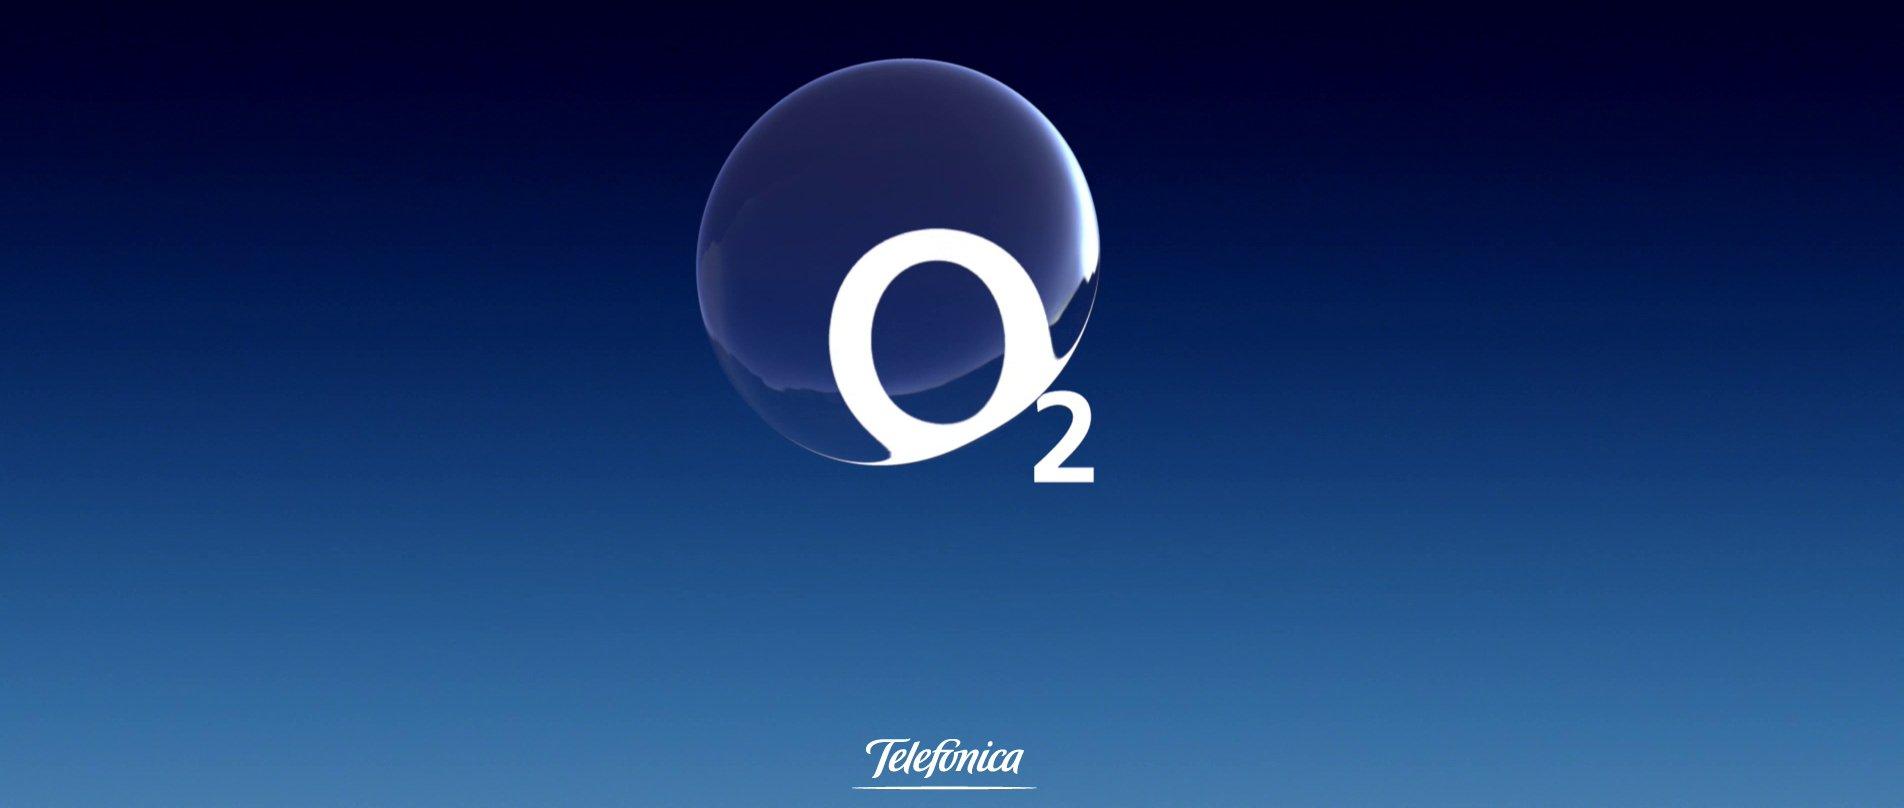 iTunes Store: Zahlen via o2 auf Mobilfunkrechnung 12